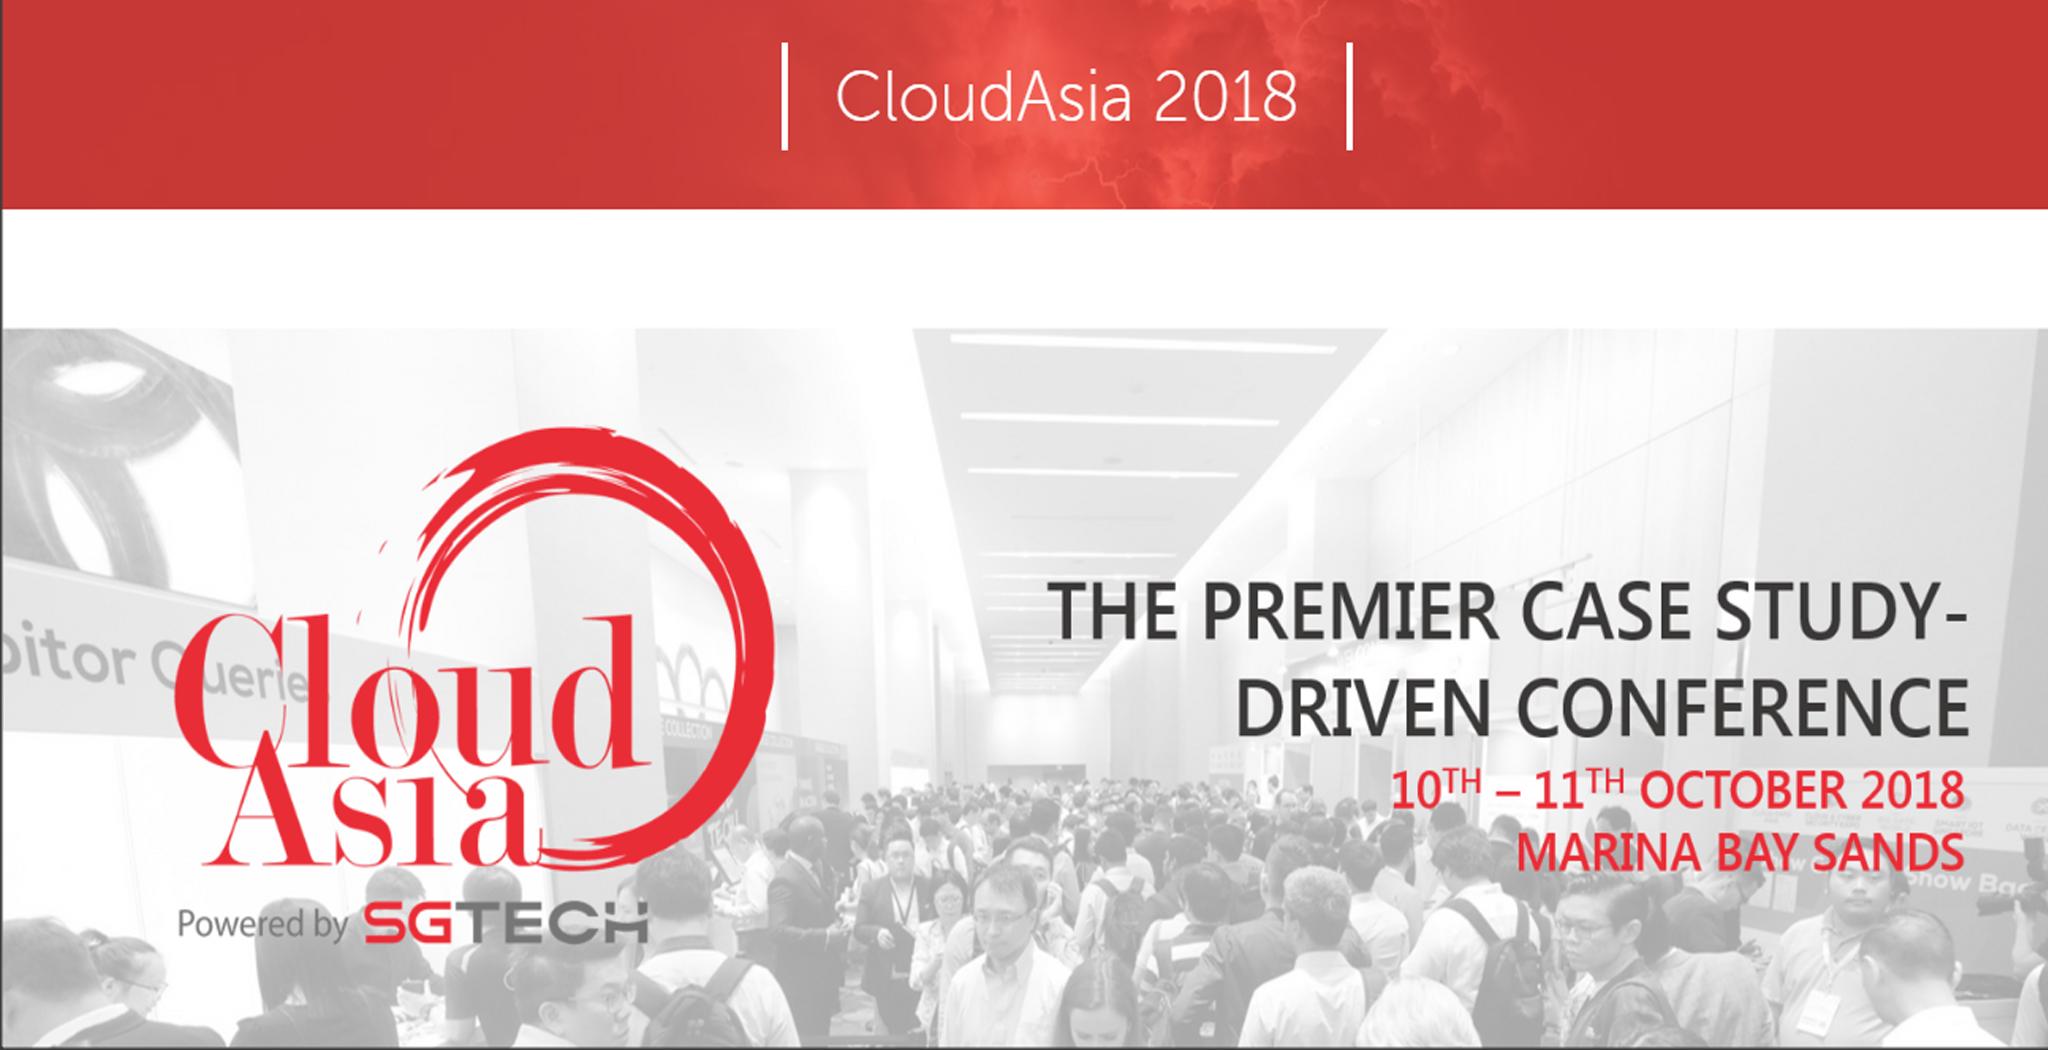 Cloud Expo Asia Singapore 2018 showcases